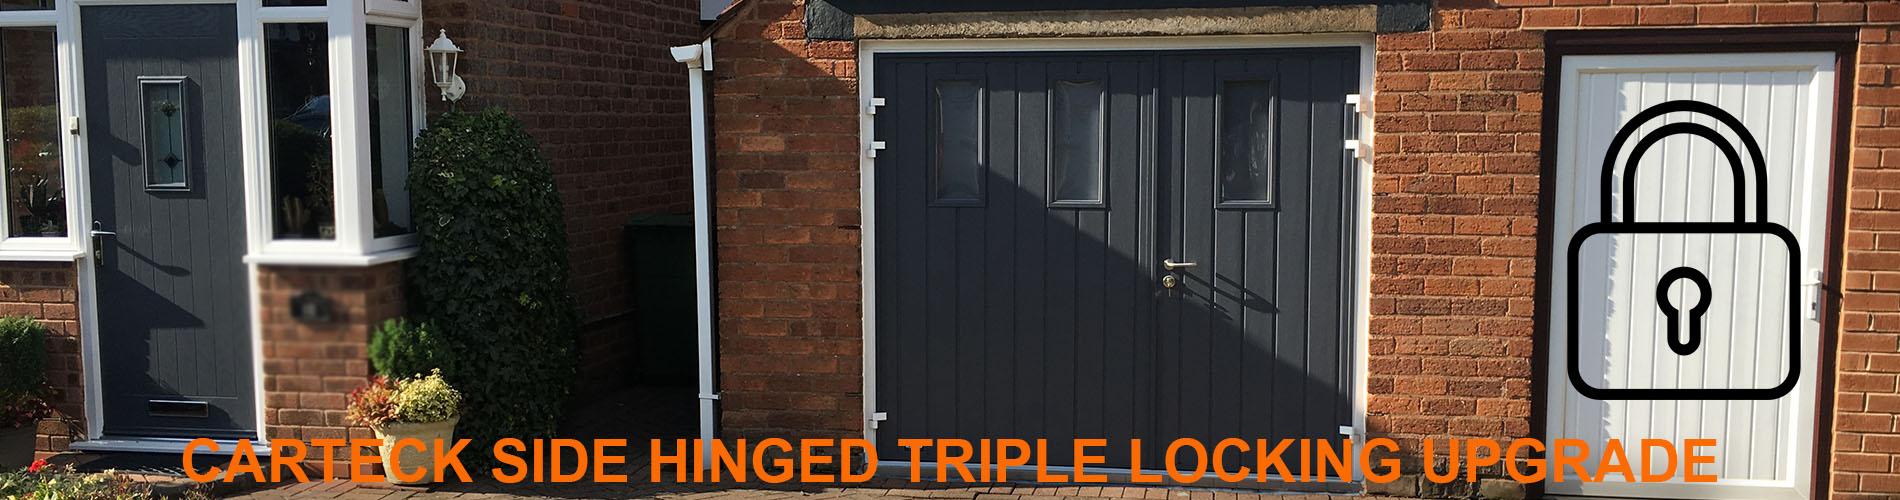 carteck sde hinged triple locking